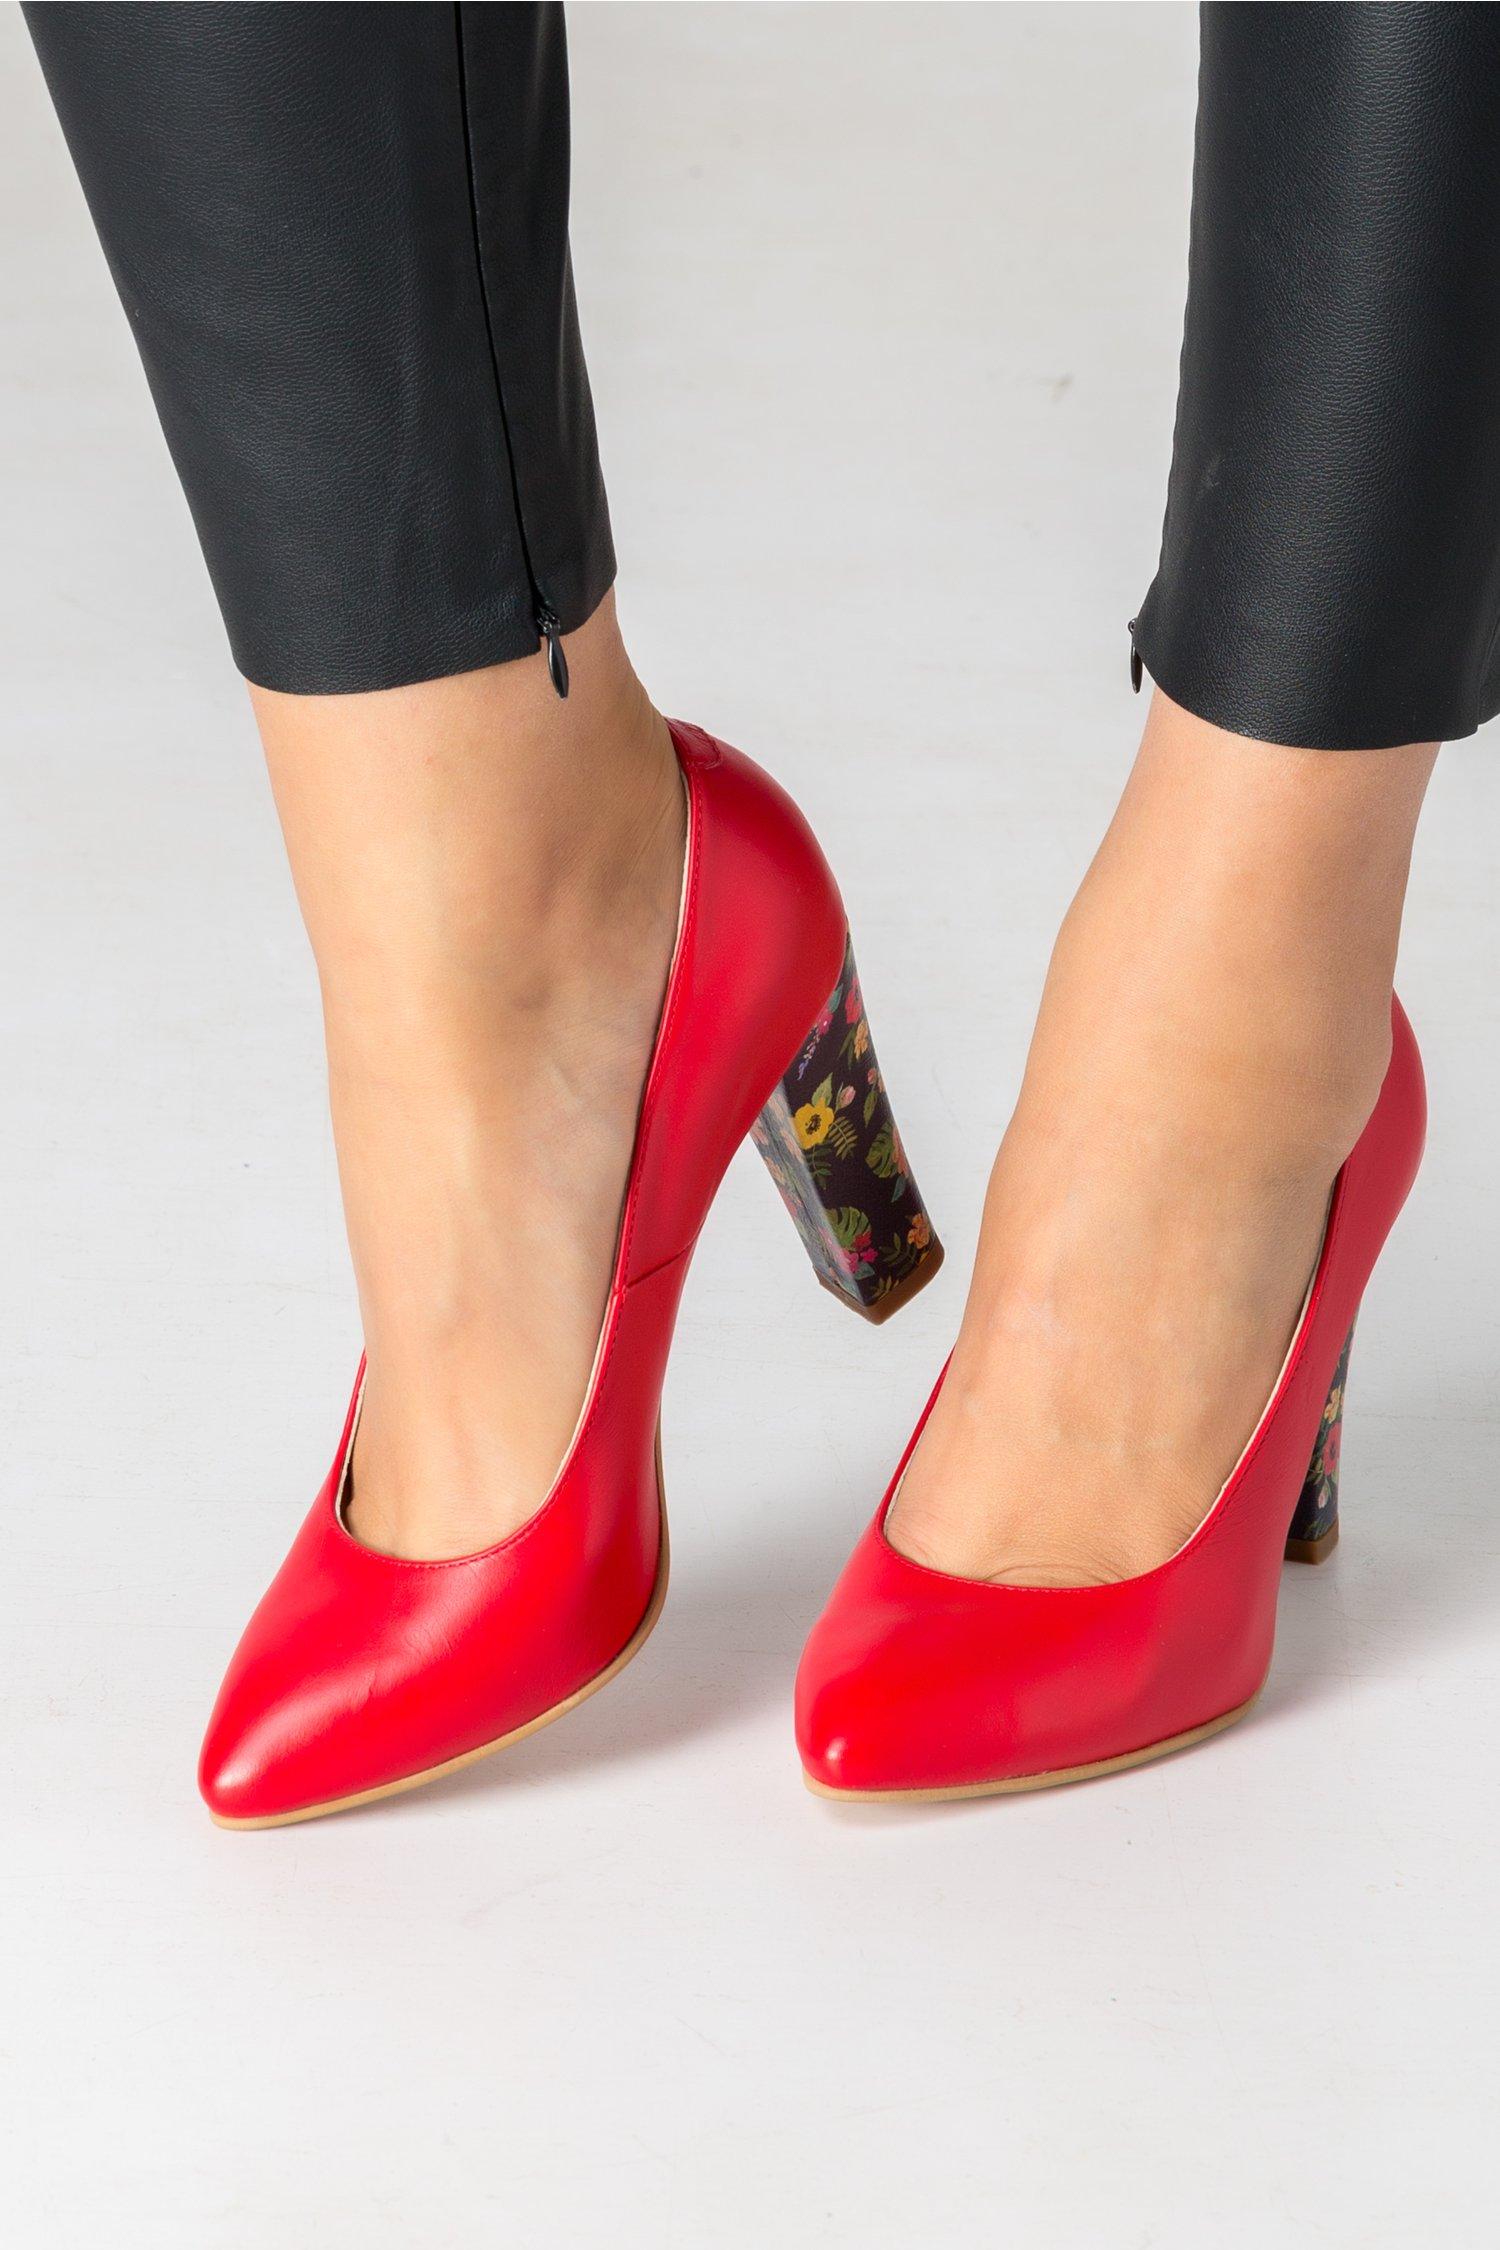 Pantofi rosi cu imprimeu floral pe toc